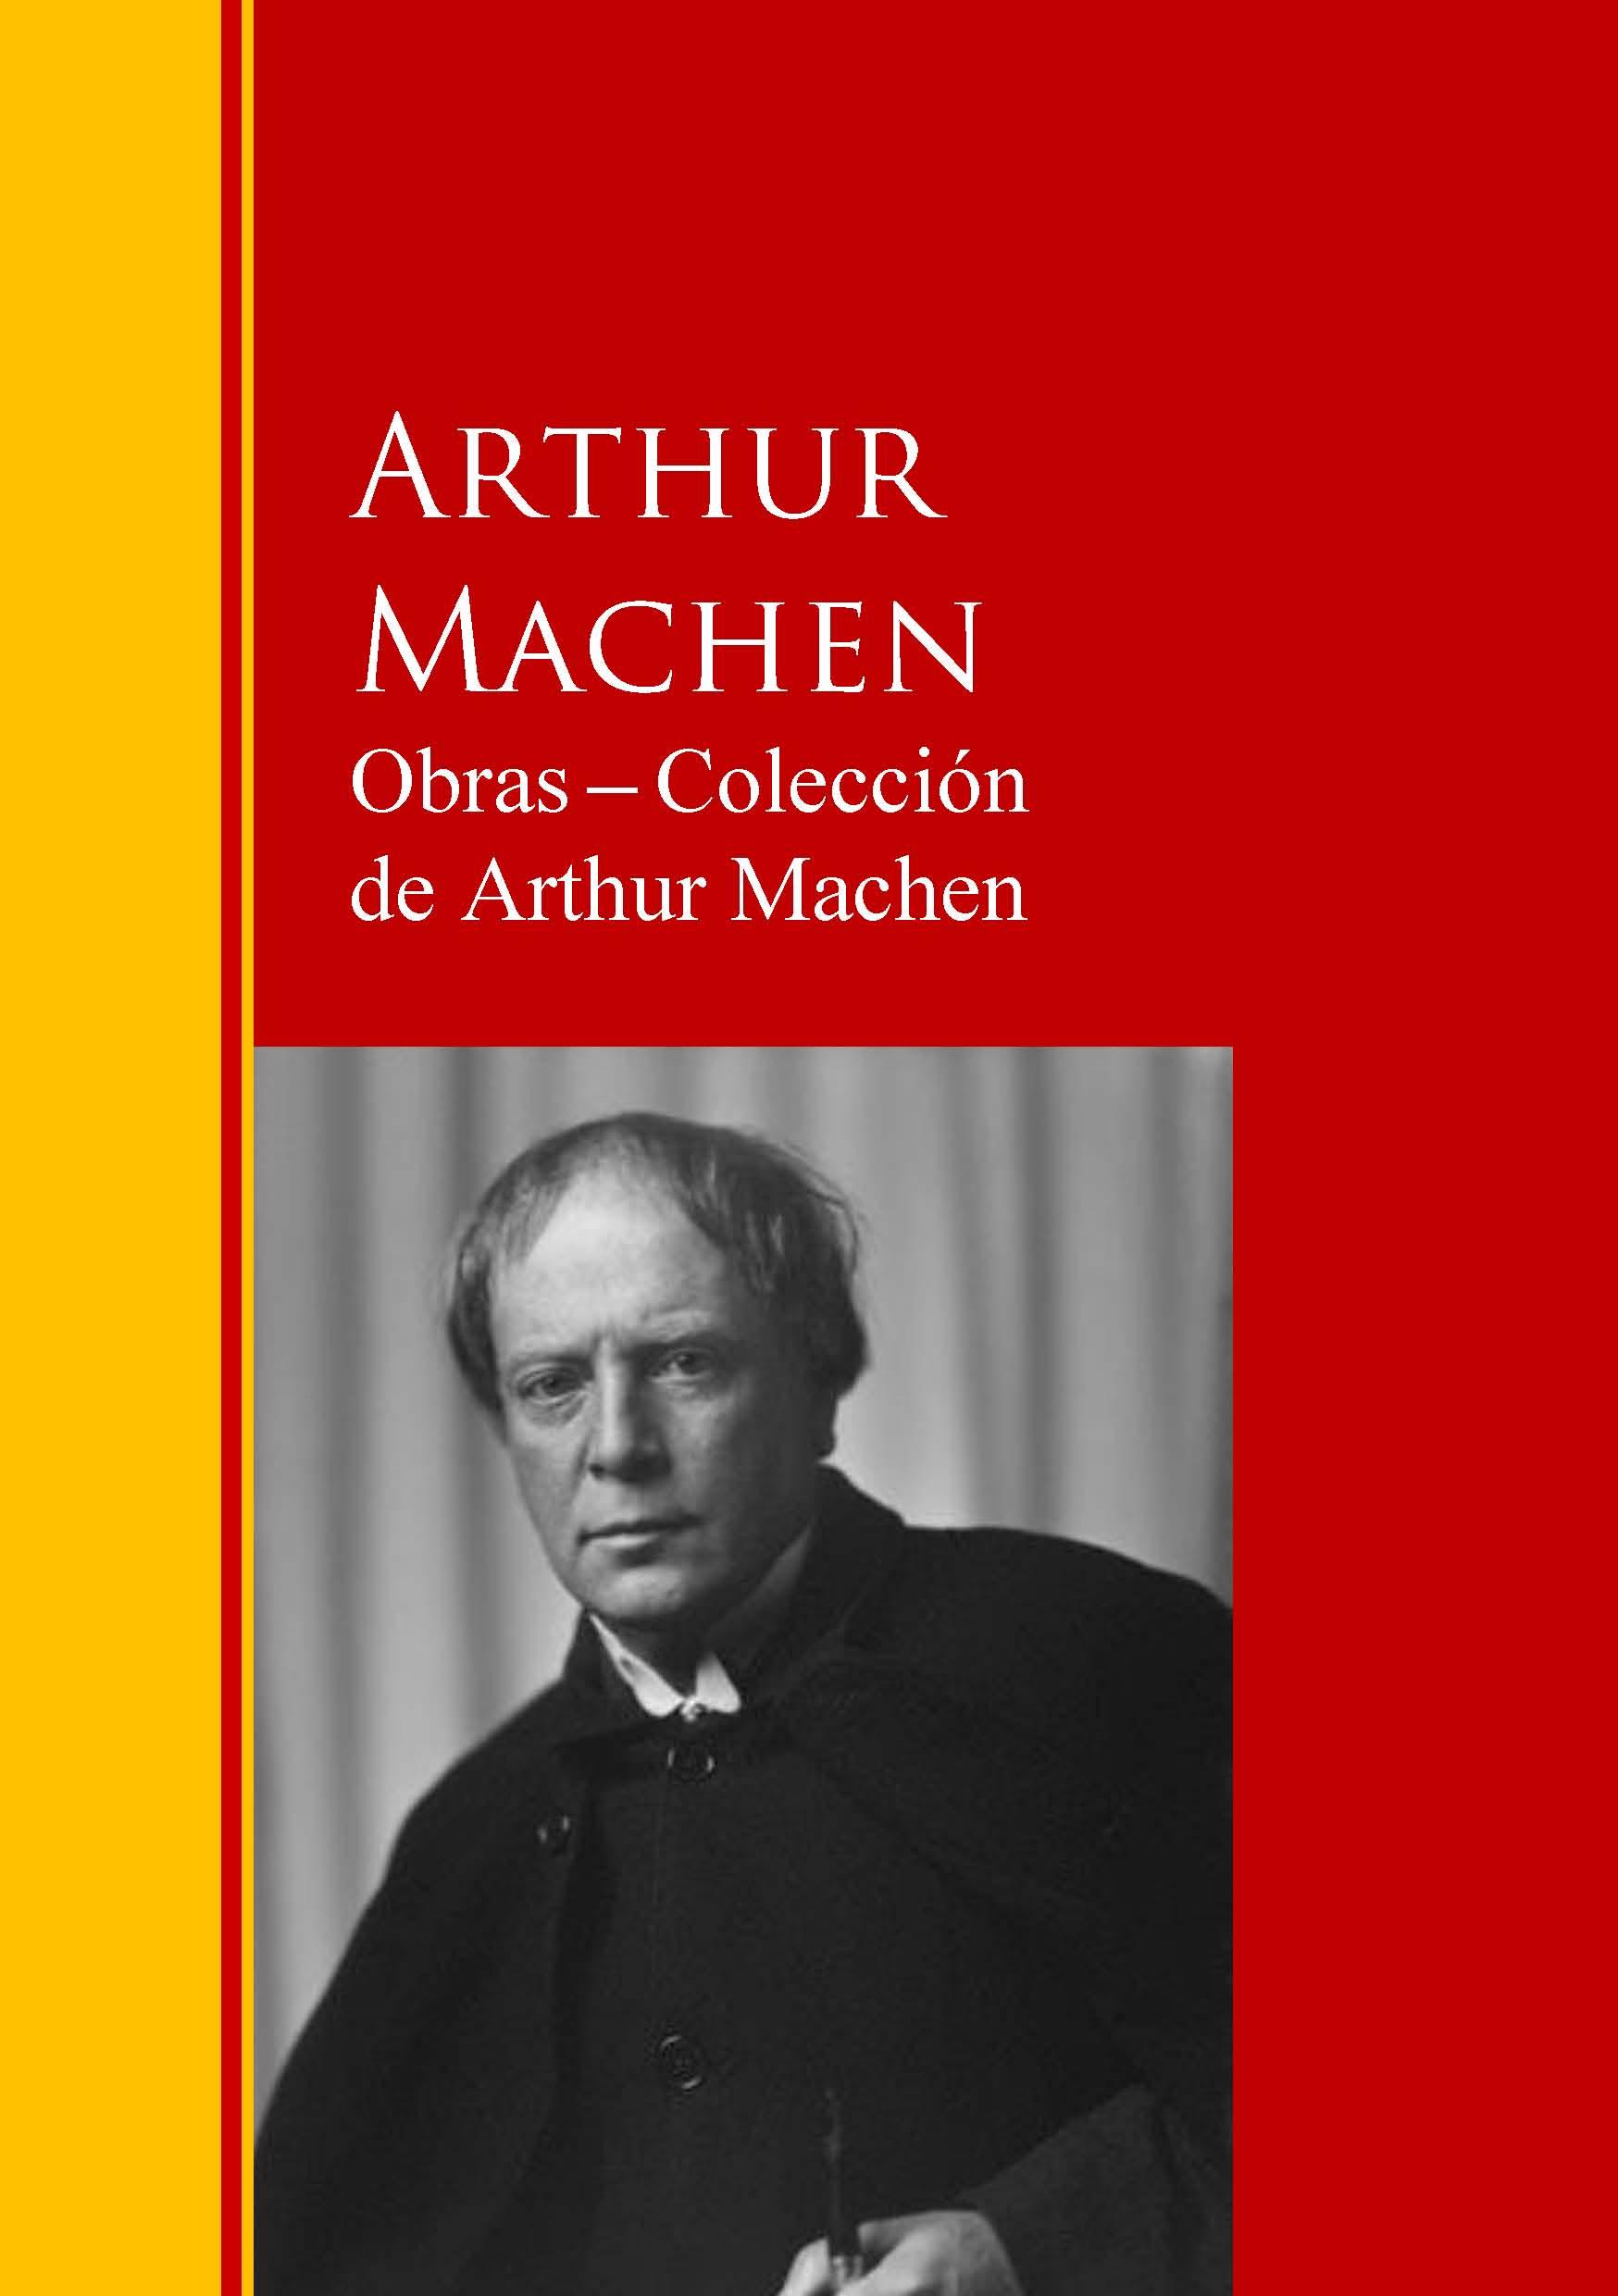 Arthur Machen Obras ─ Colección de Arthur Machen kleider machen leute